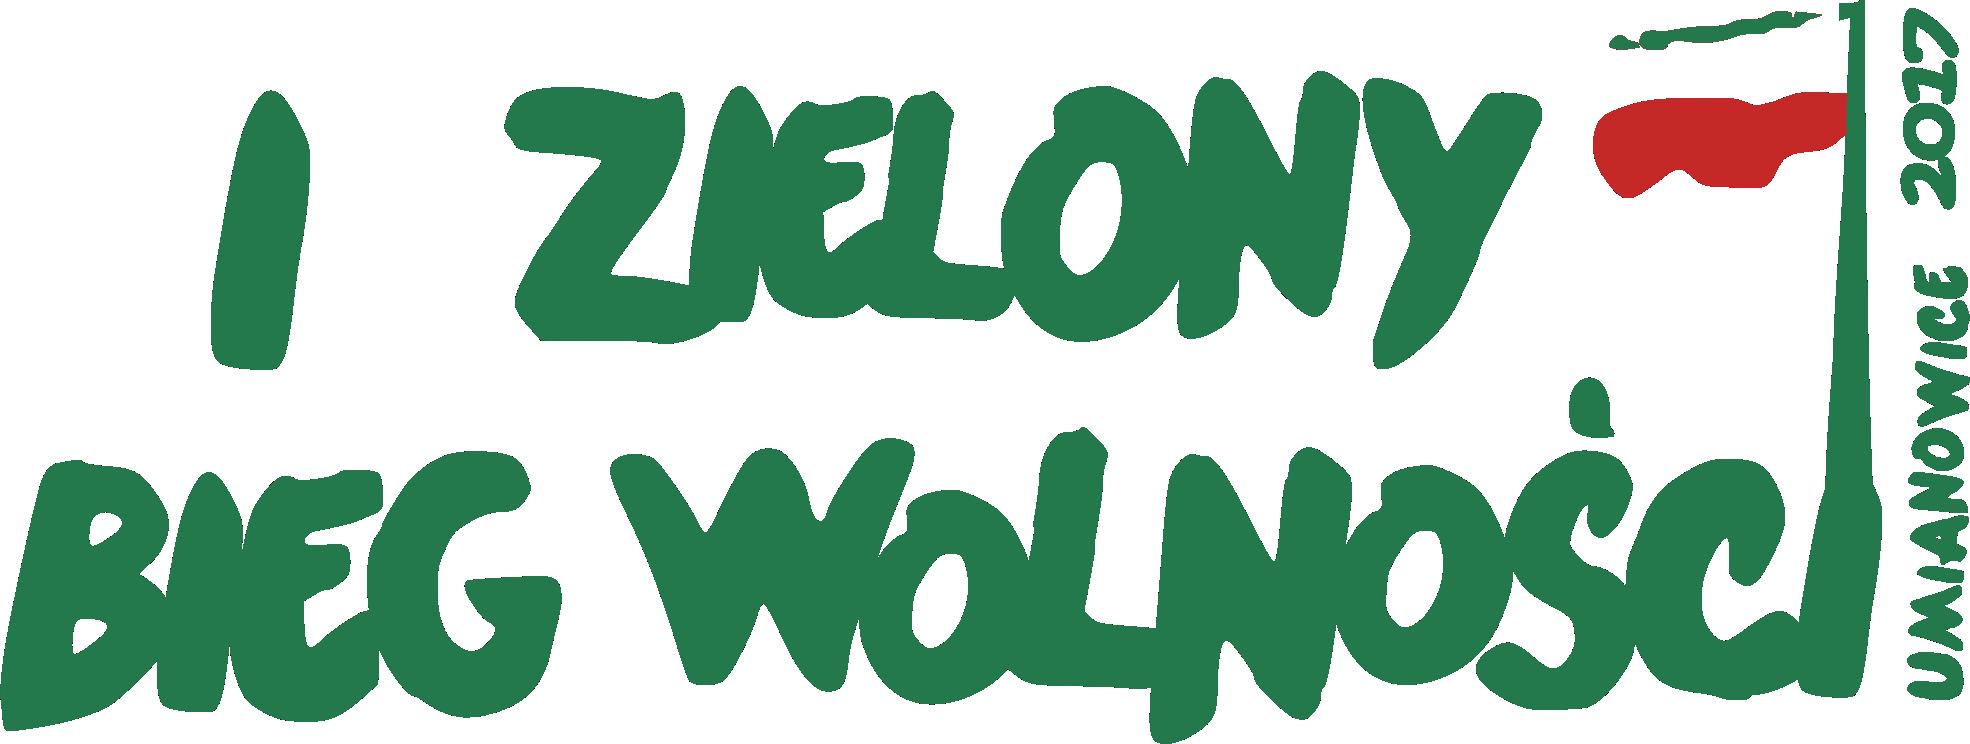 logo-bieg